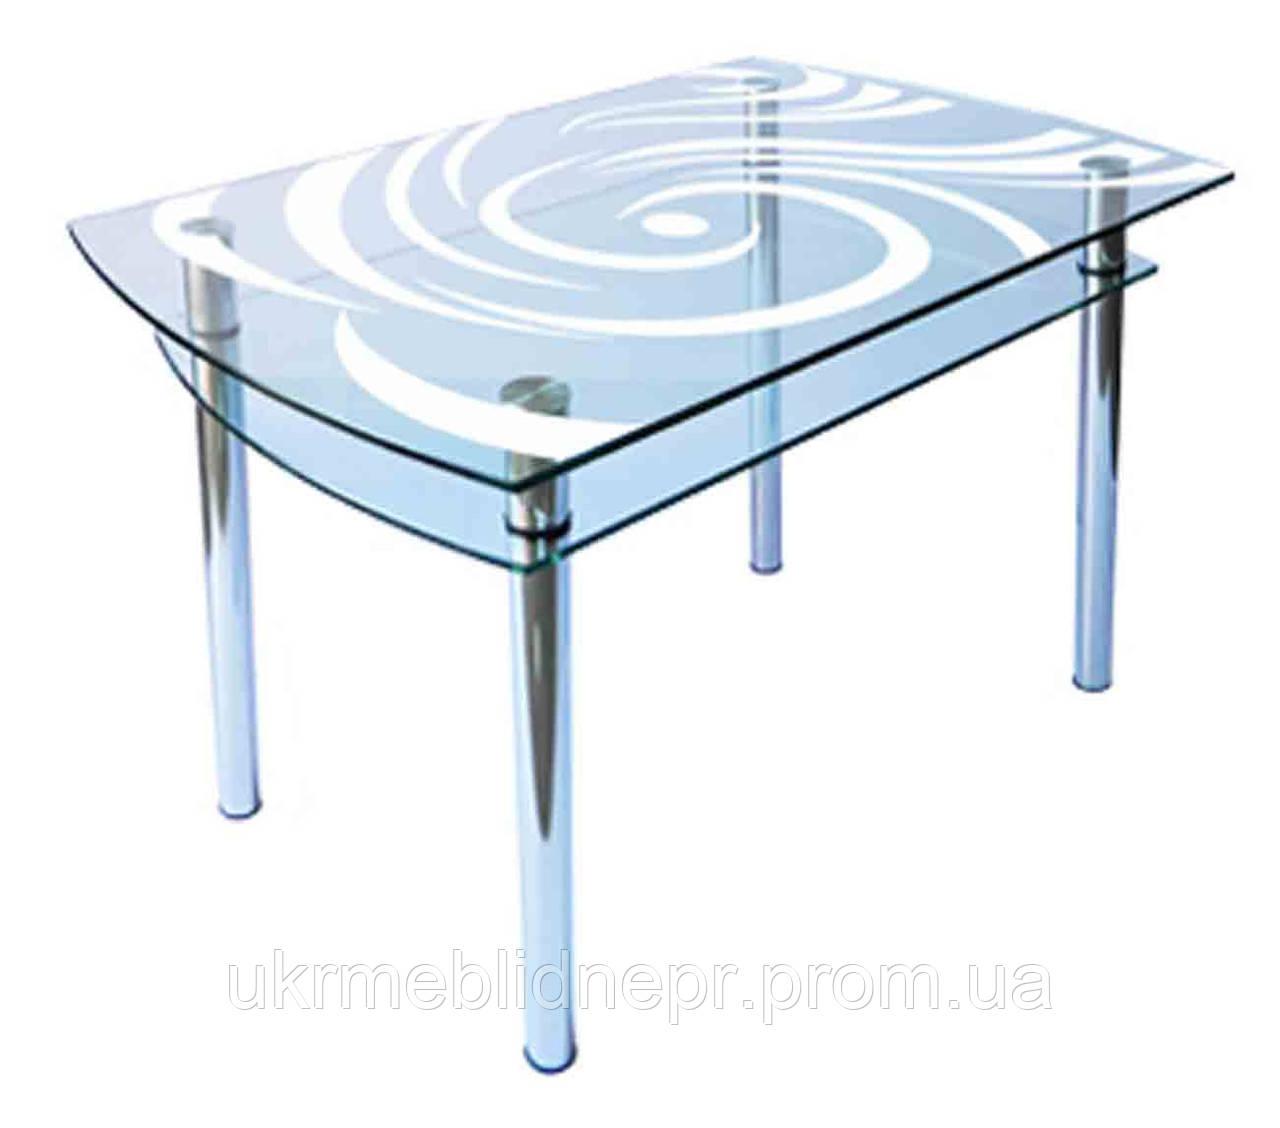 Обеденный стол КС- 4